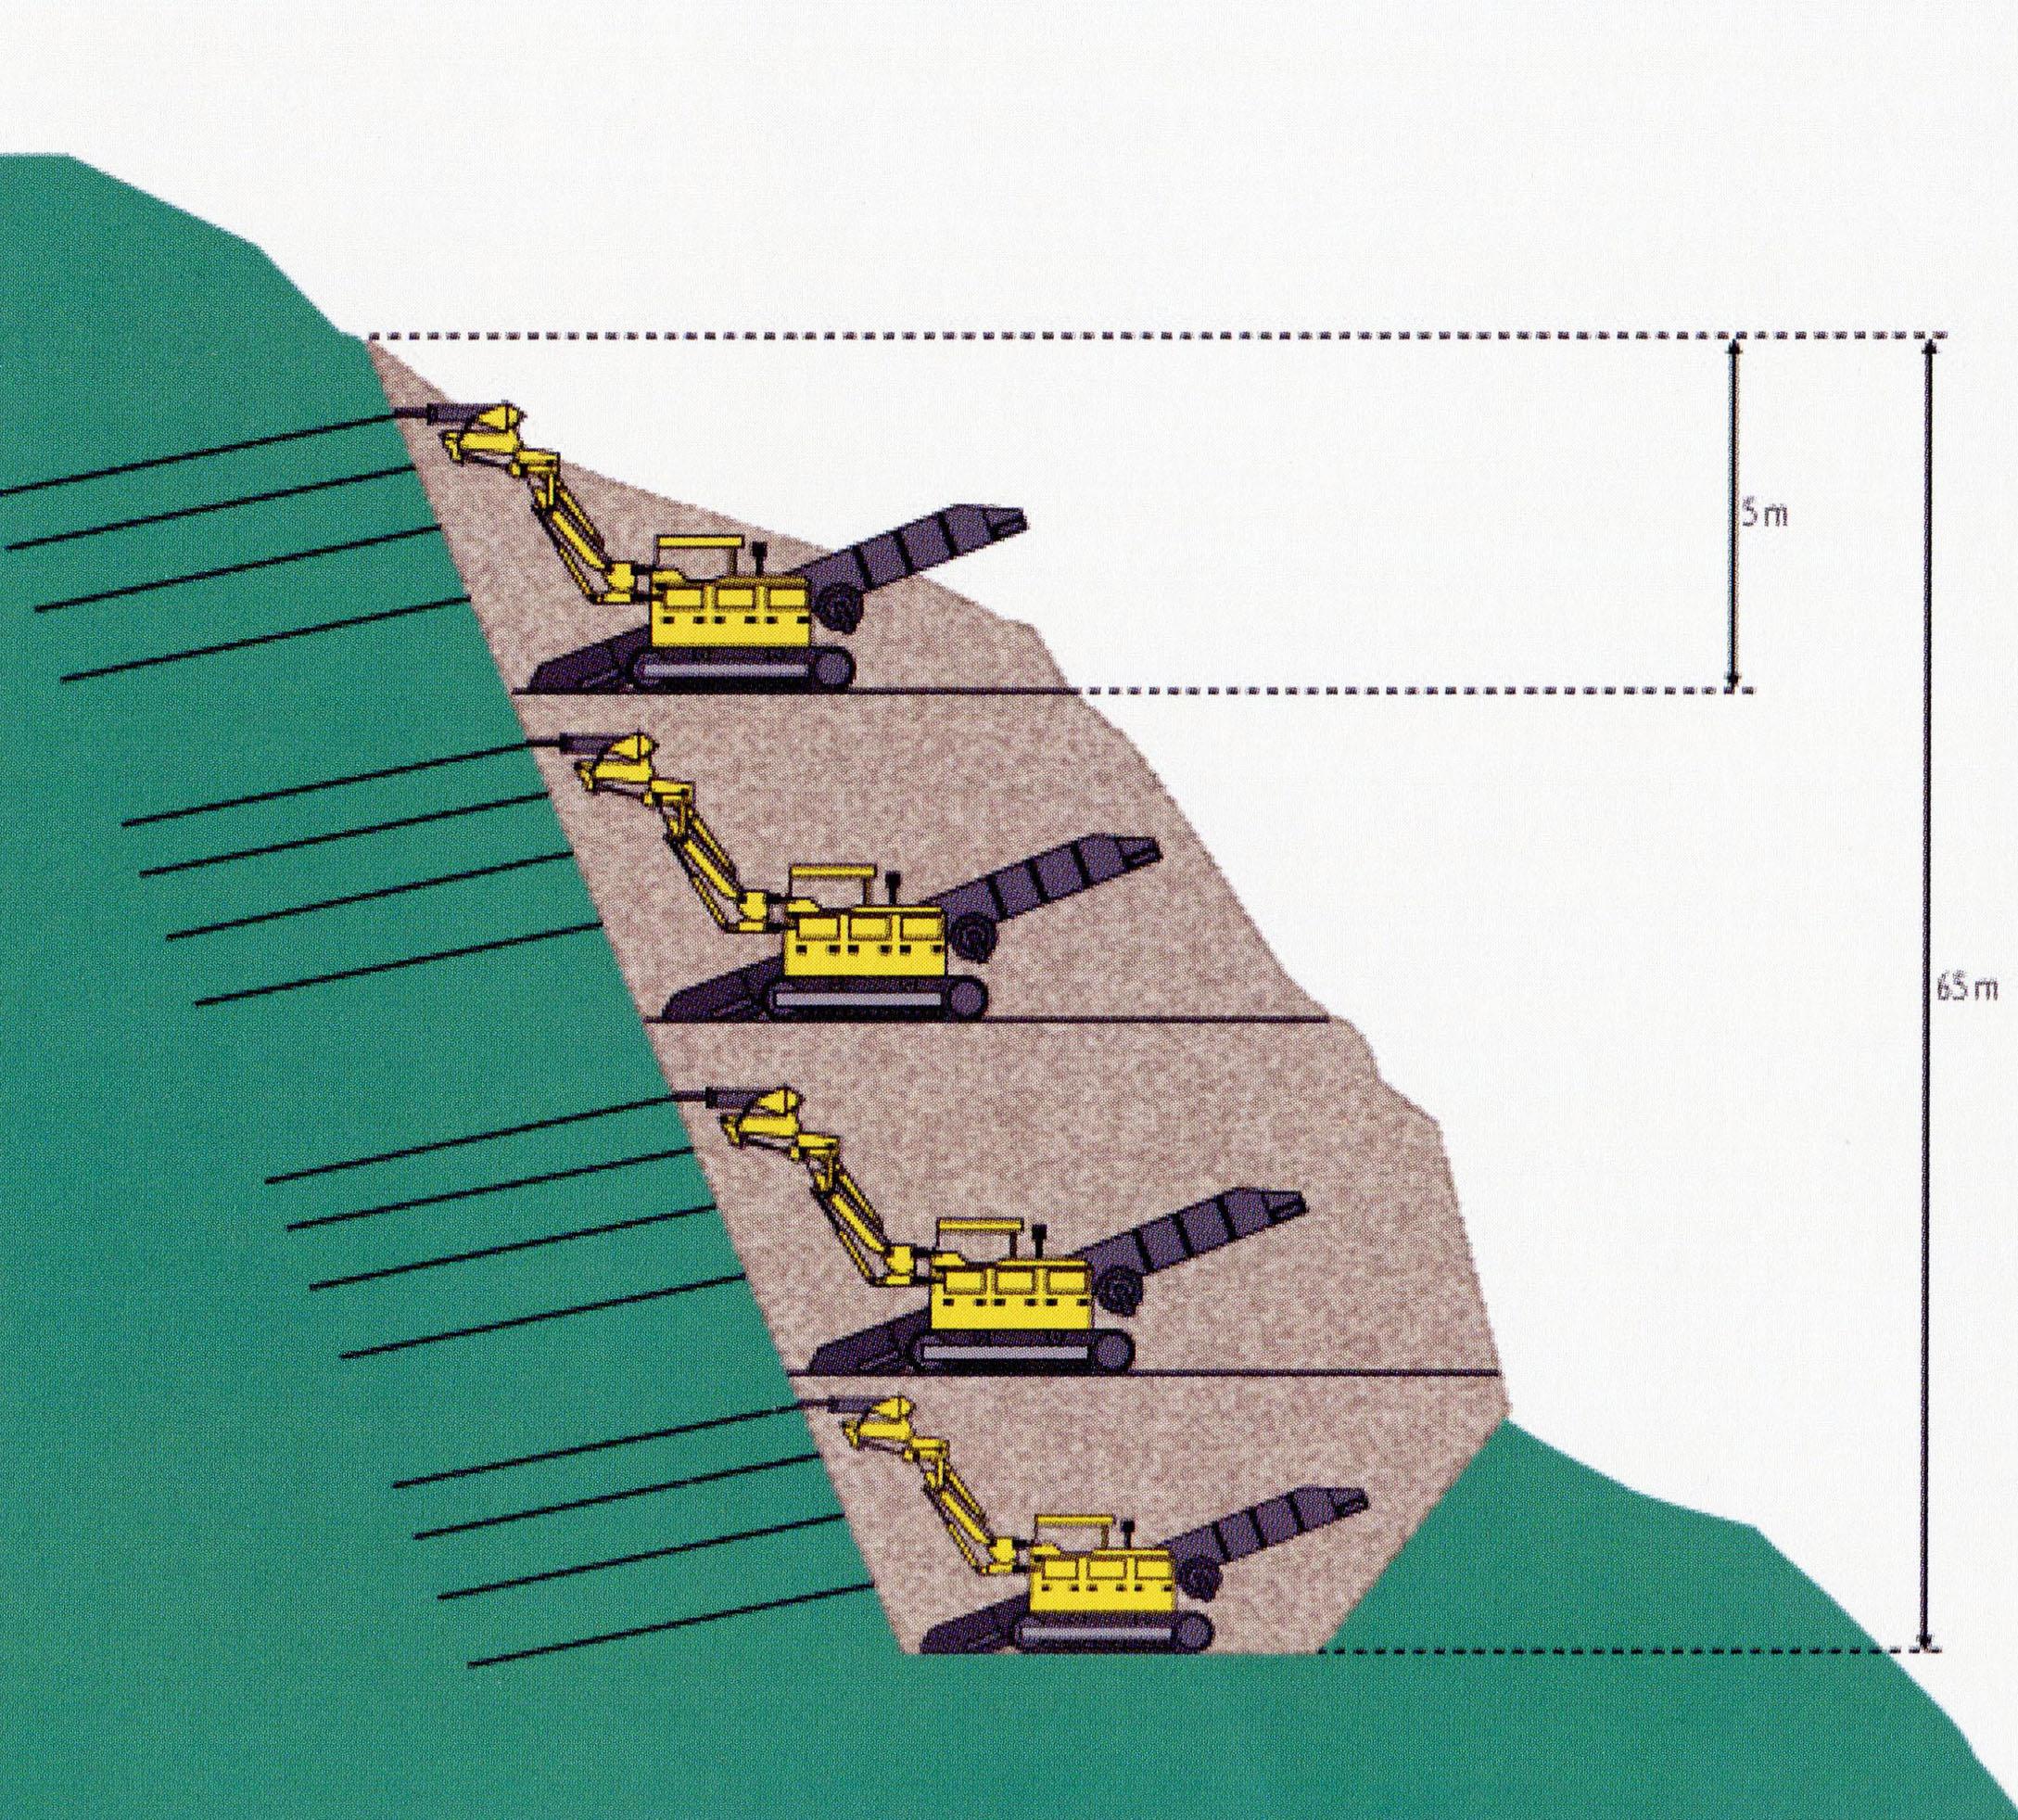 slope orientation diagram phone wall socket wiring australia file sanmarcosexcavation jpg highestbridges